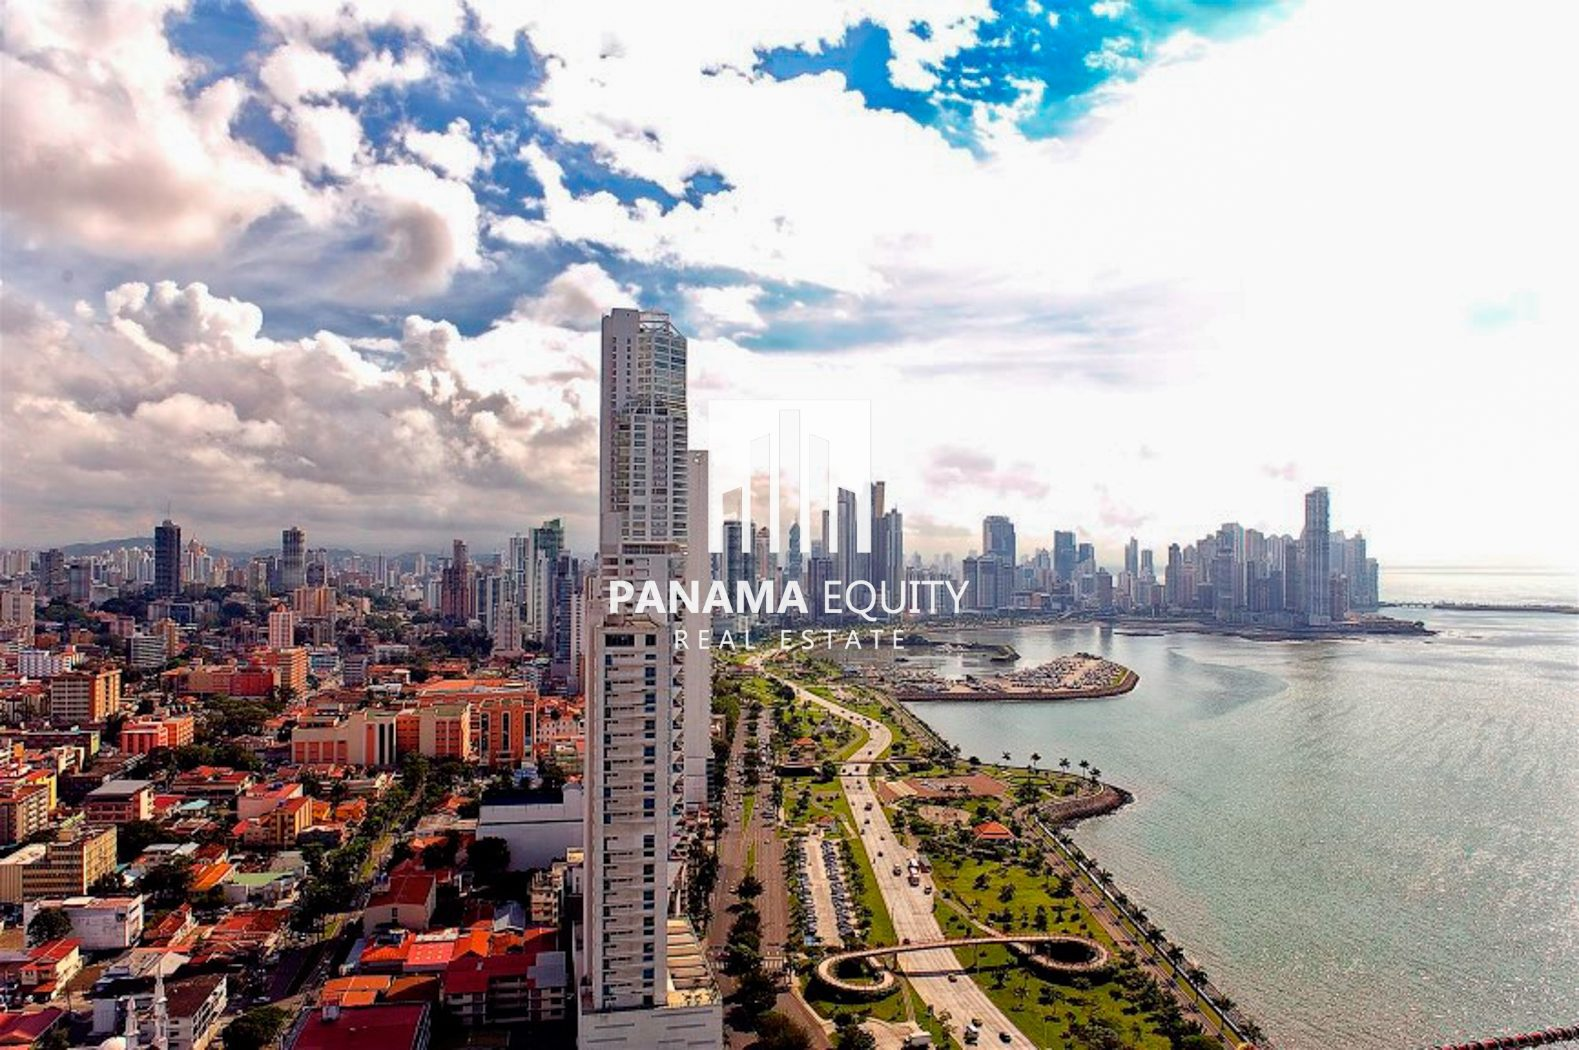 Ave. Balboa Panama stalled development for sale